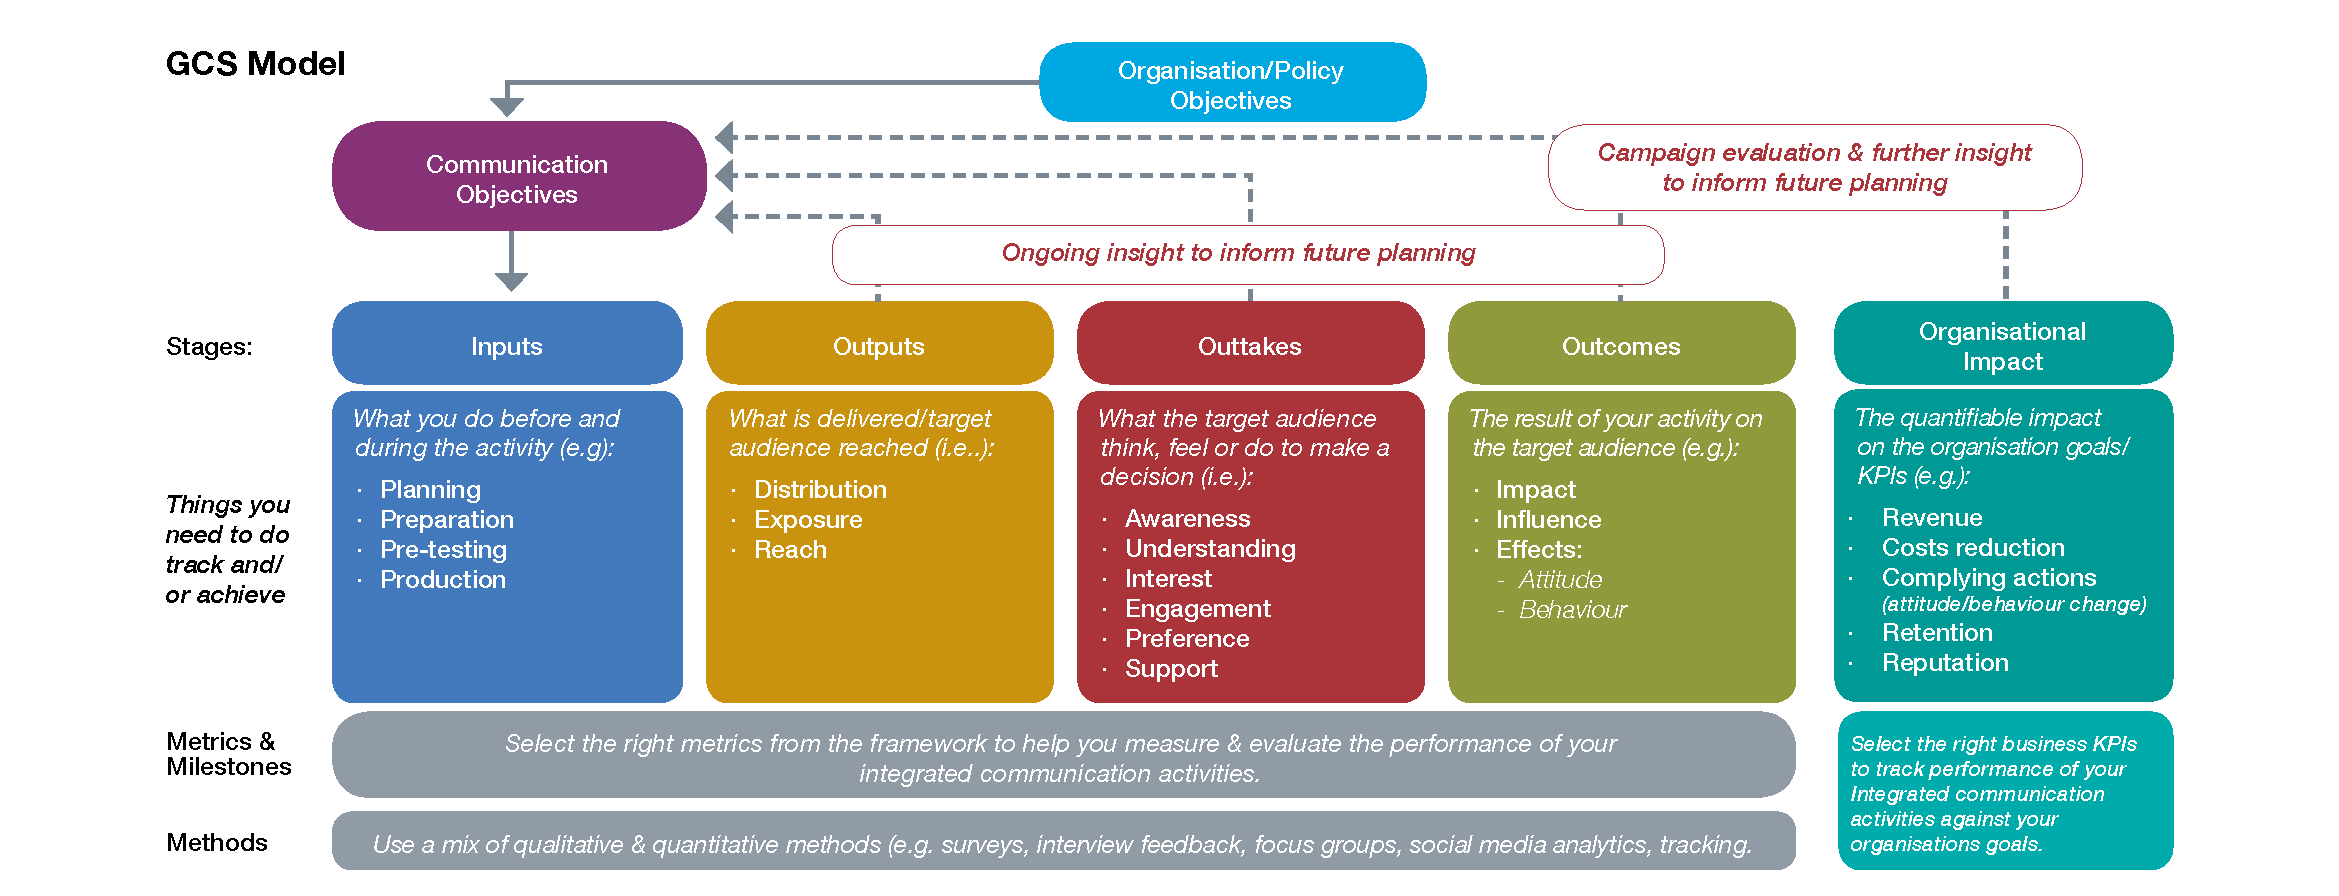 Inputs Outputs Outcomes GCS